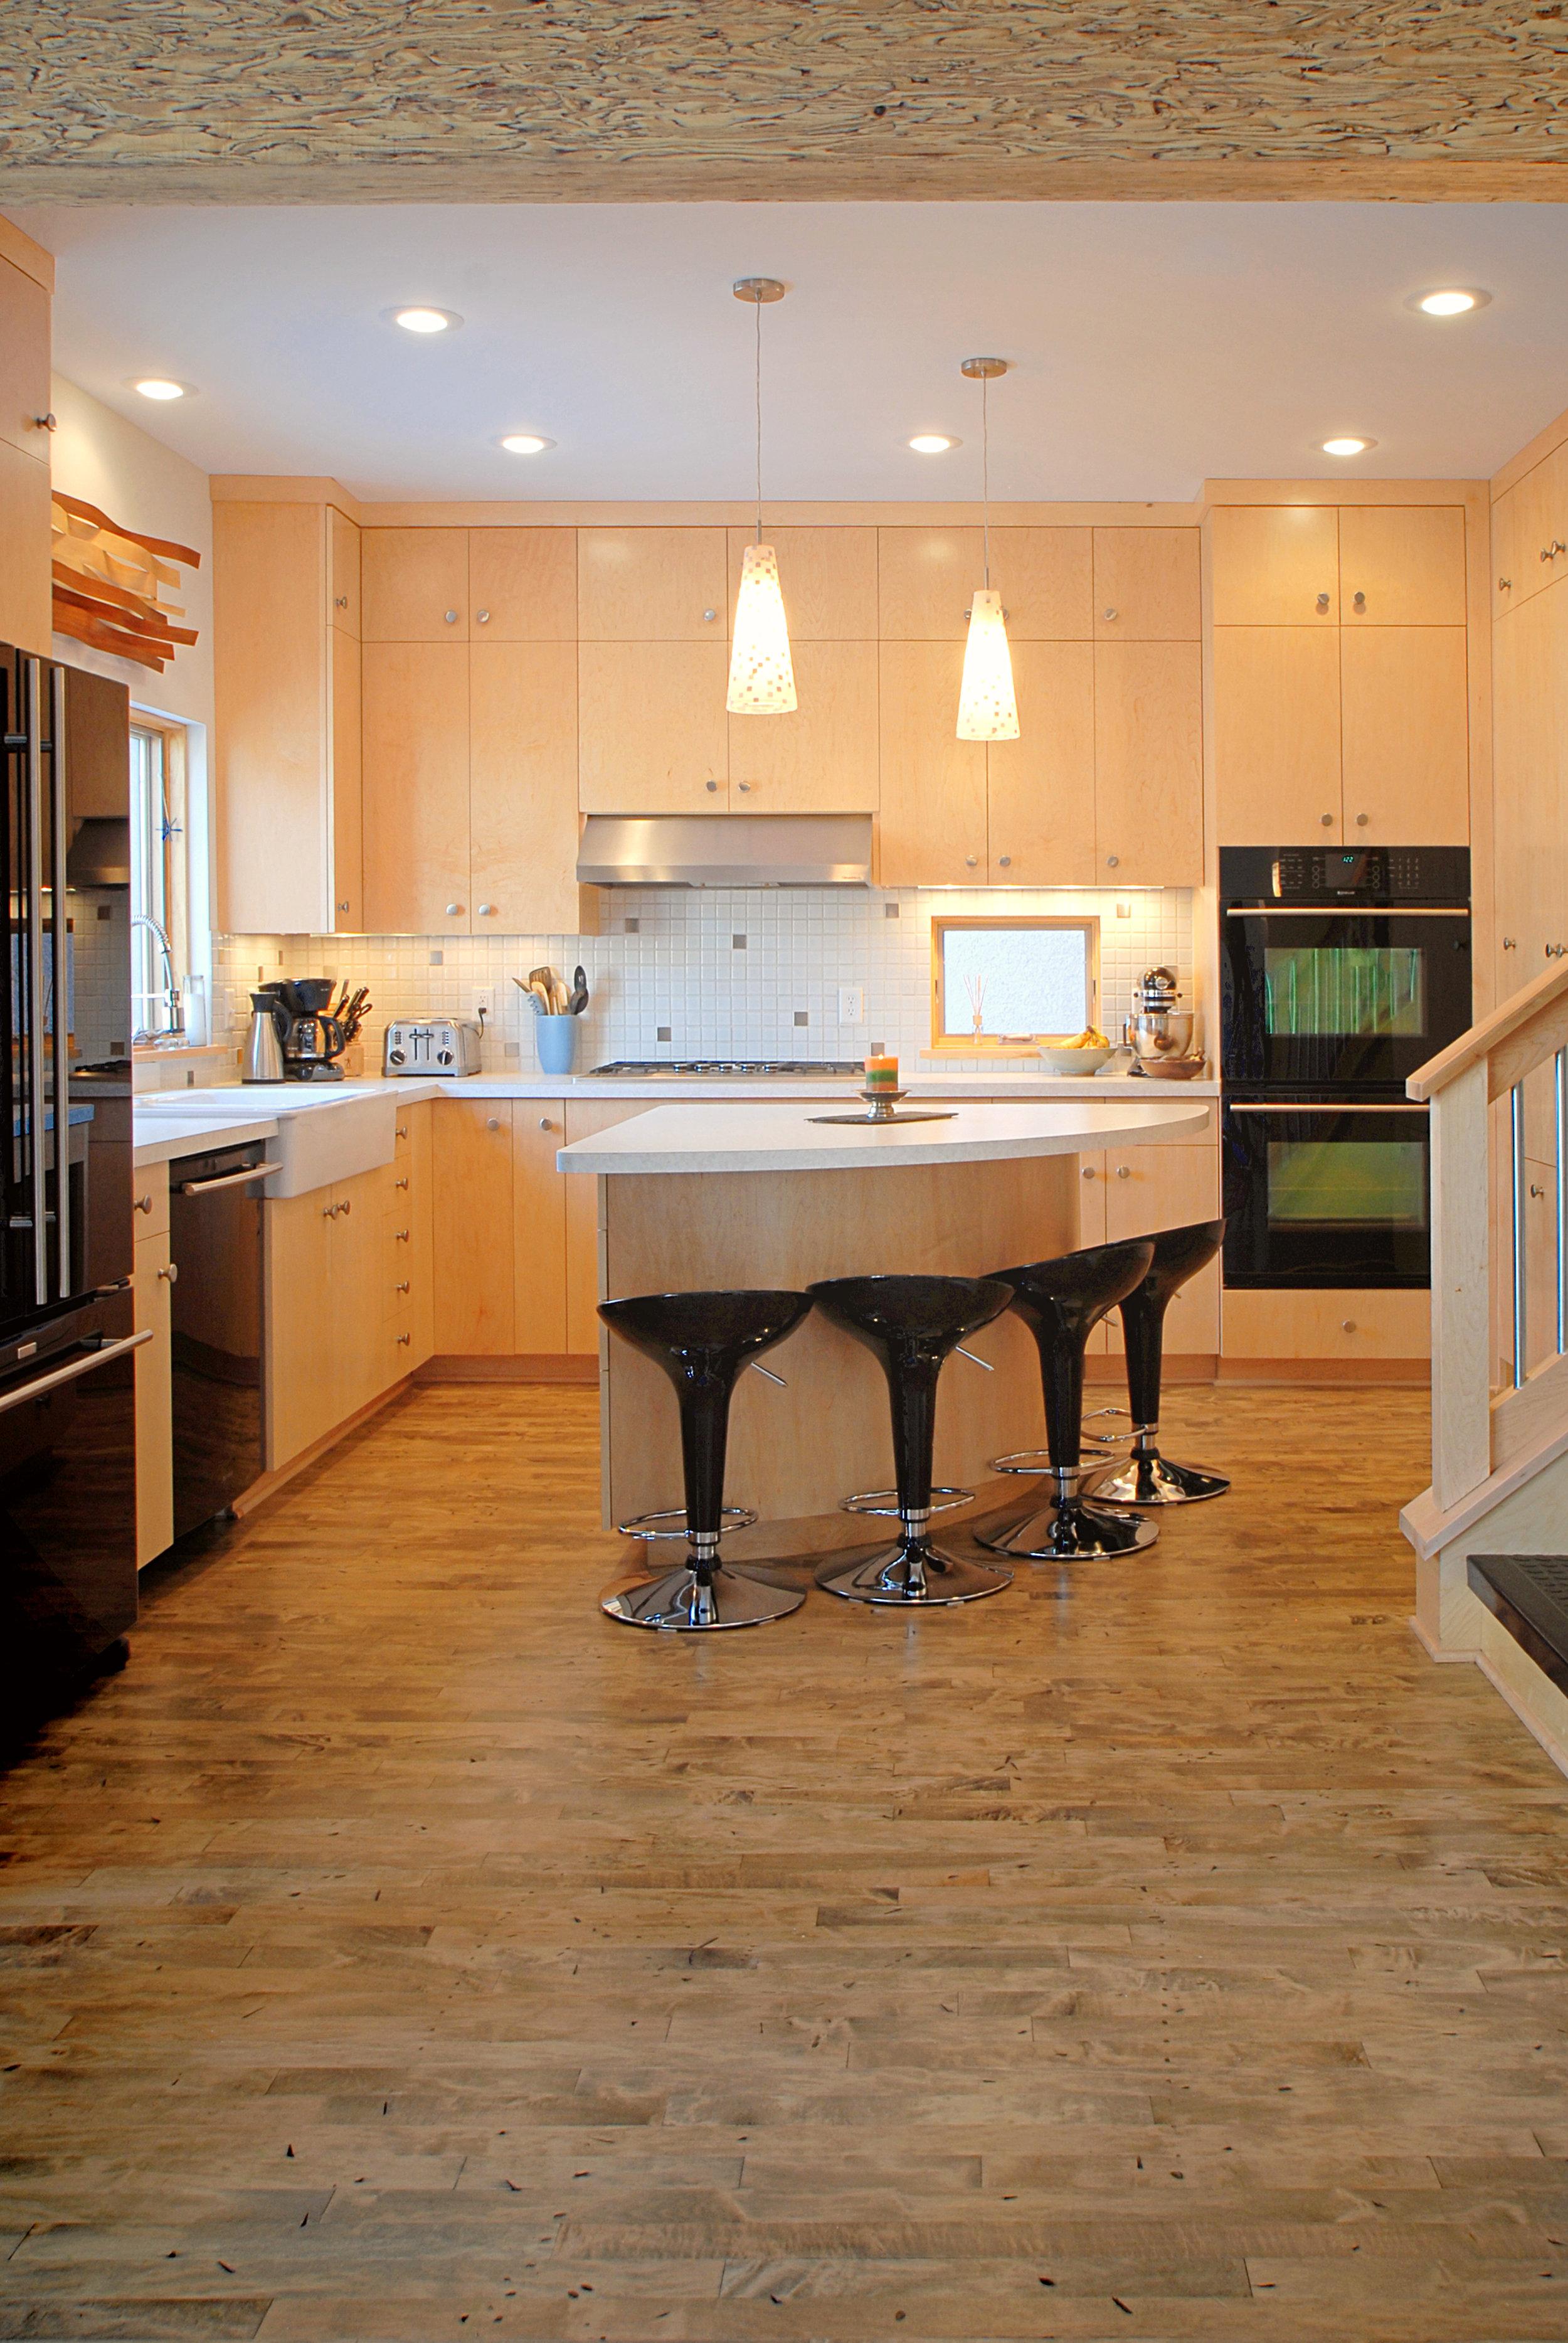 New City Home | Interior | Kitchen